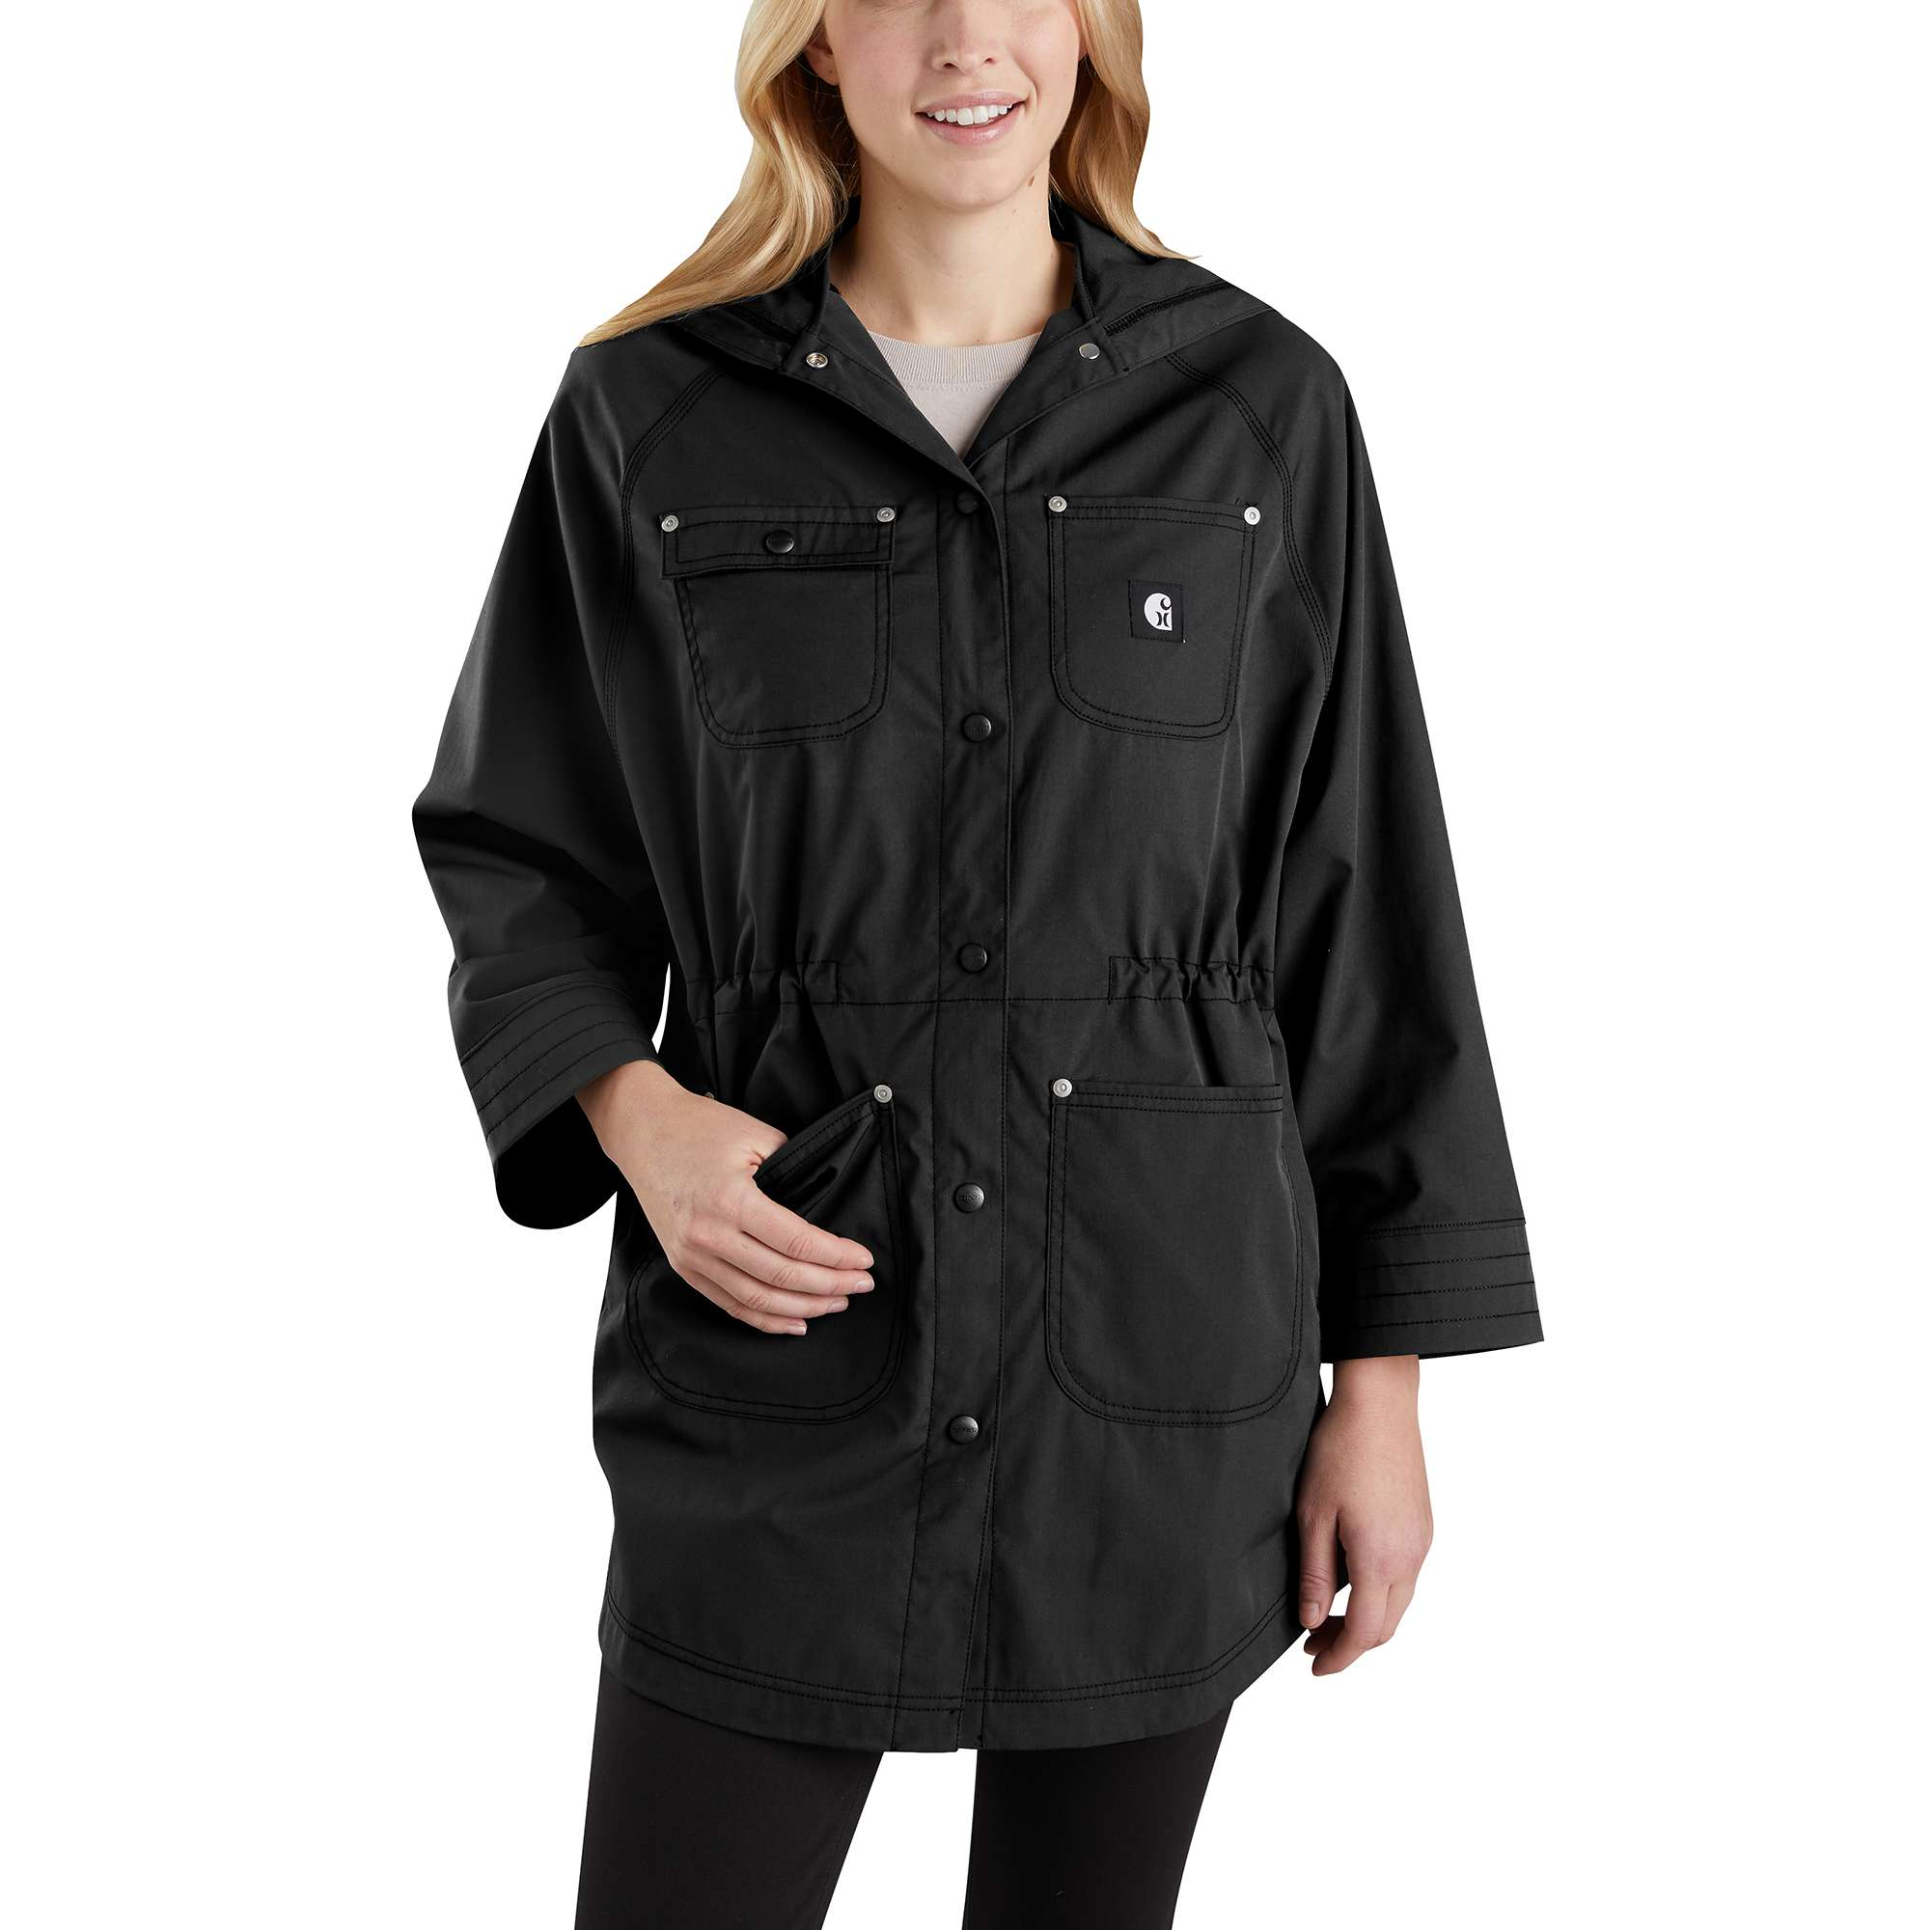 Carhartt Hurley x Carhartt Women's Jacket